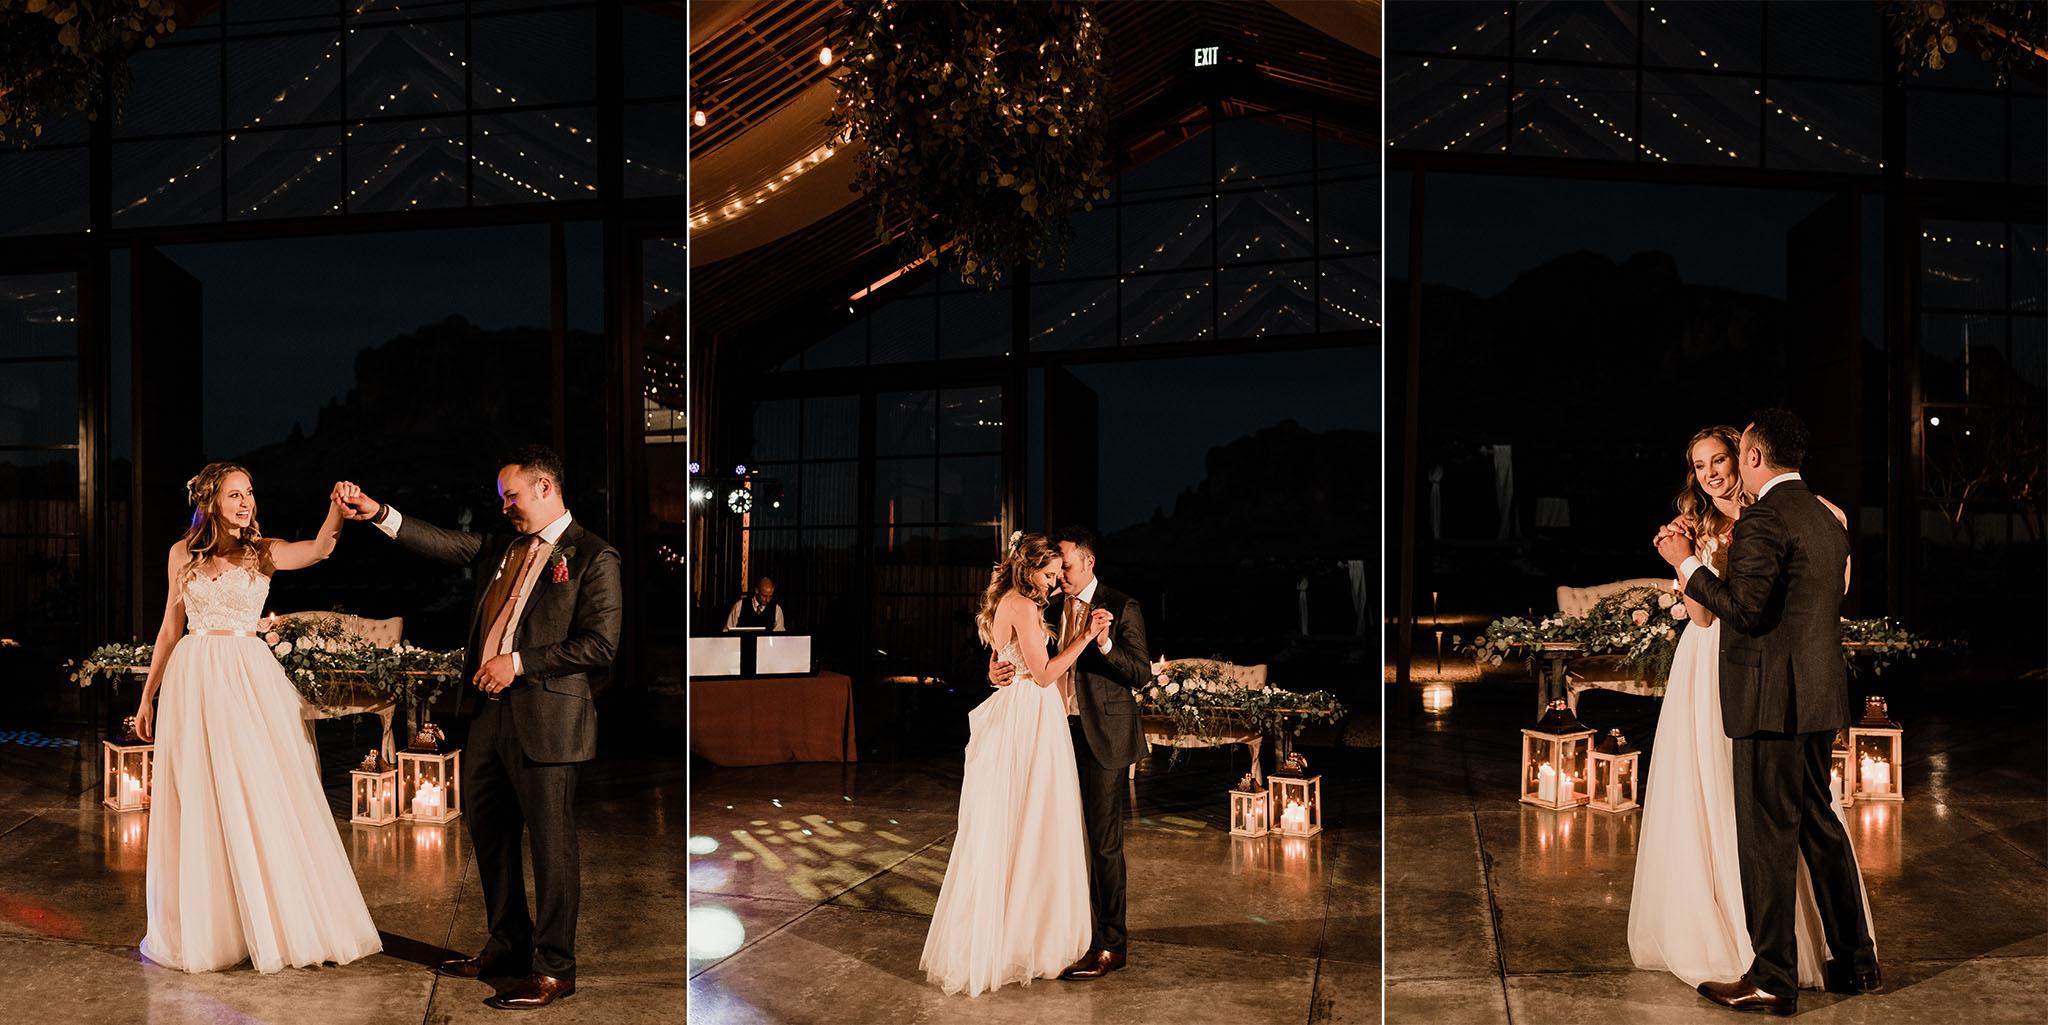 Arizona-Wedding-Photographer-The-Paseo-Venue48.jpg